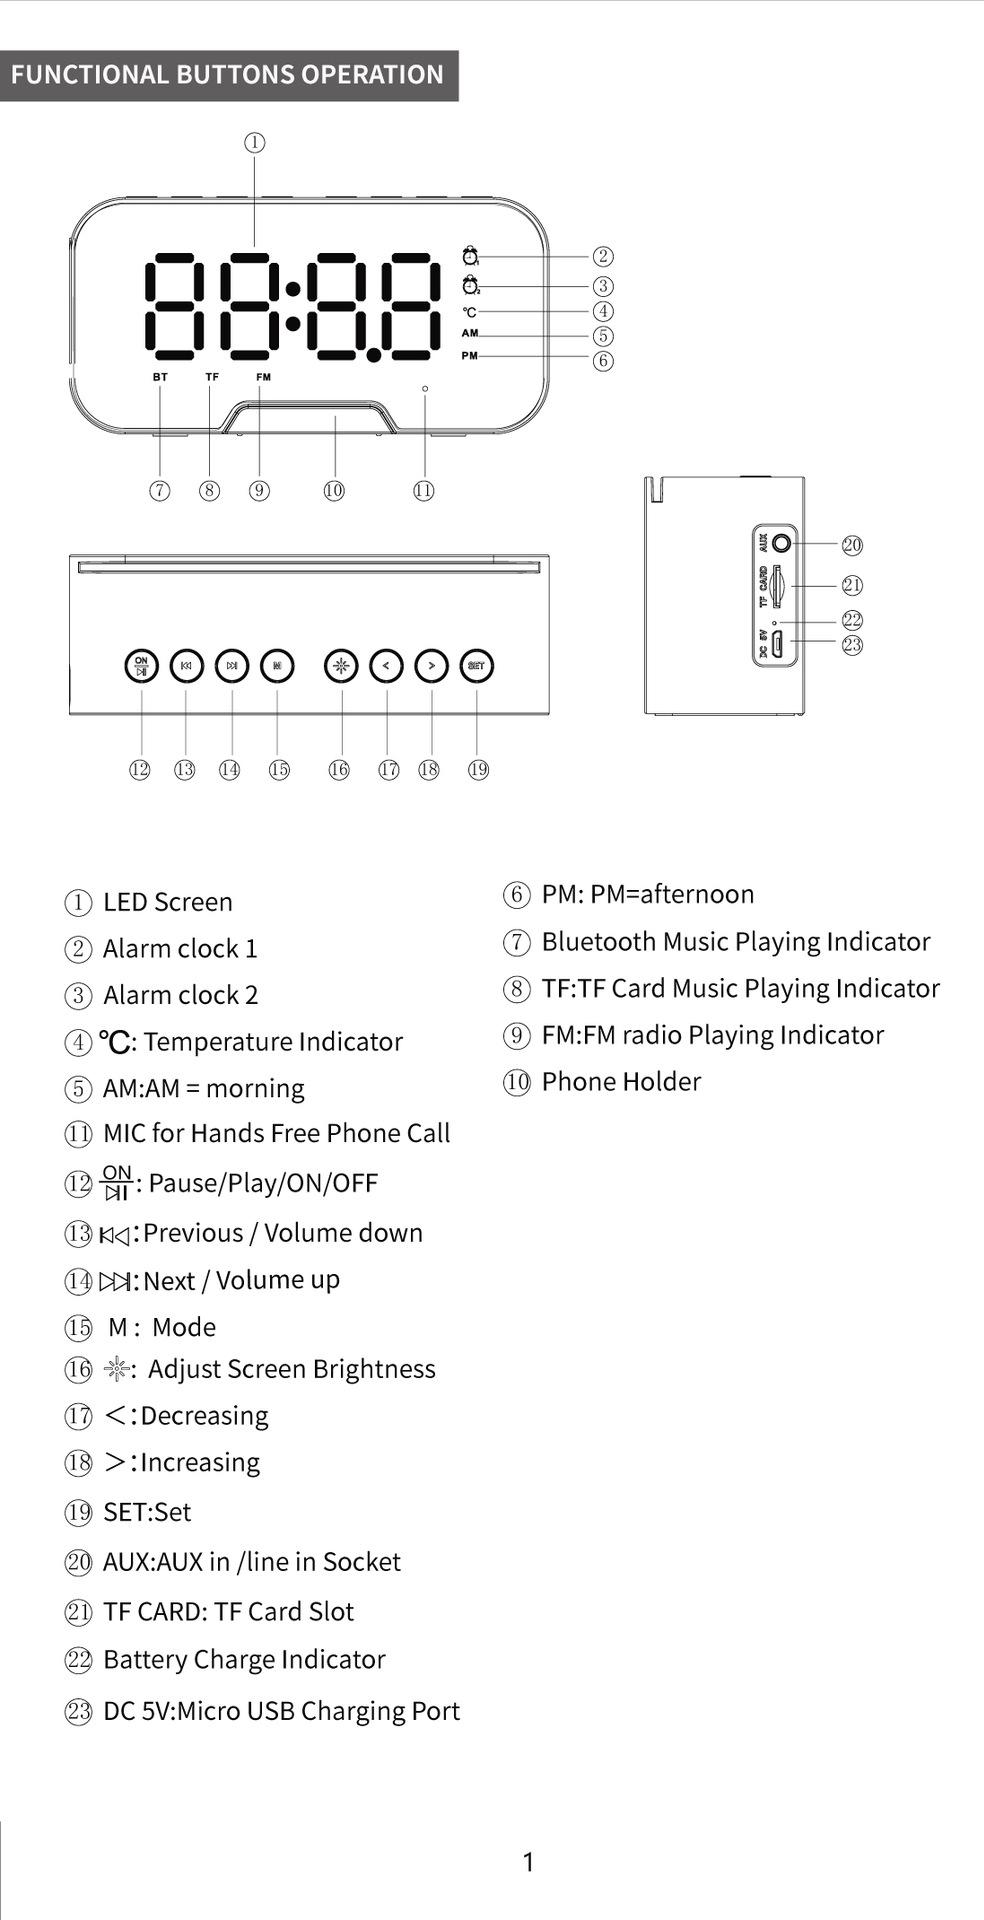 Mirror desk clock with BT speaker digital LED light desk & table FM radio alarm clock electronic calendars 2020 Amazon